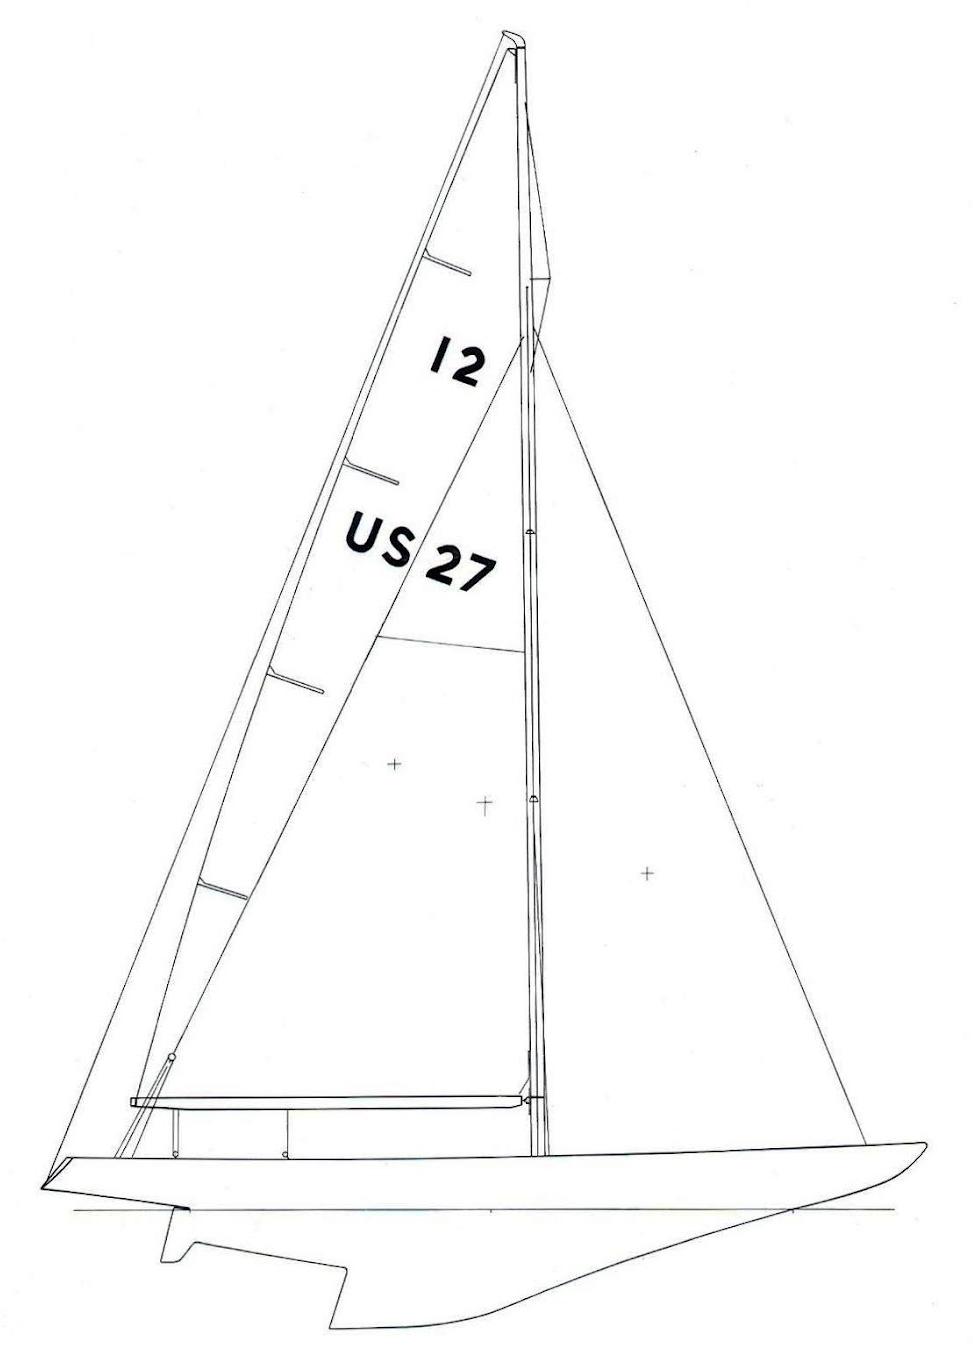 ....Sail Plan of a Sparkman & Stephens designed 12 metre yacht..Sparkman & Stephensin piirtämän 12mR -veneen purjepiirros....